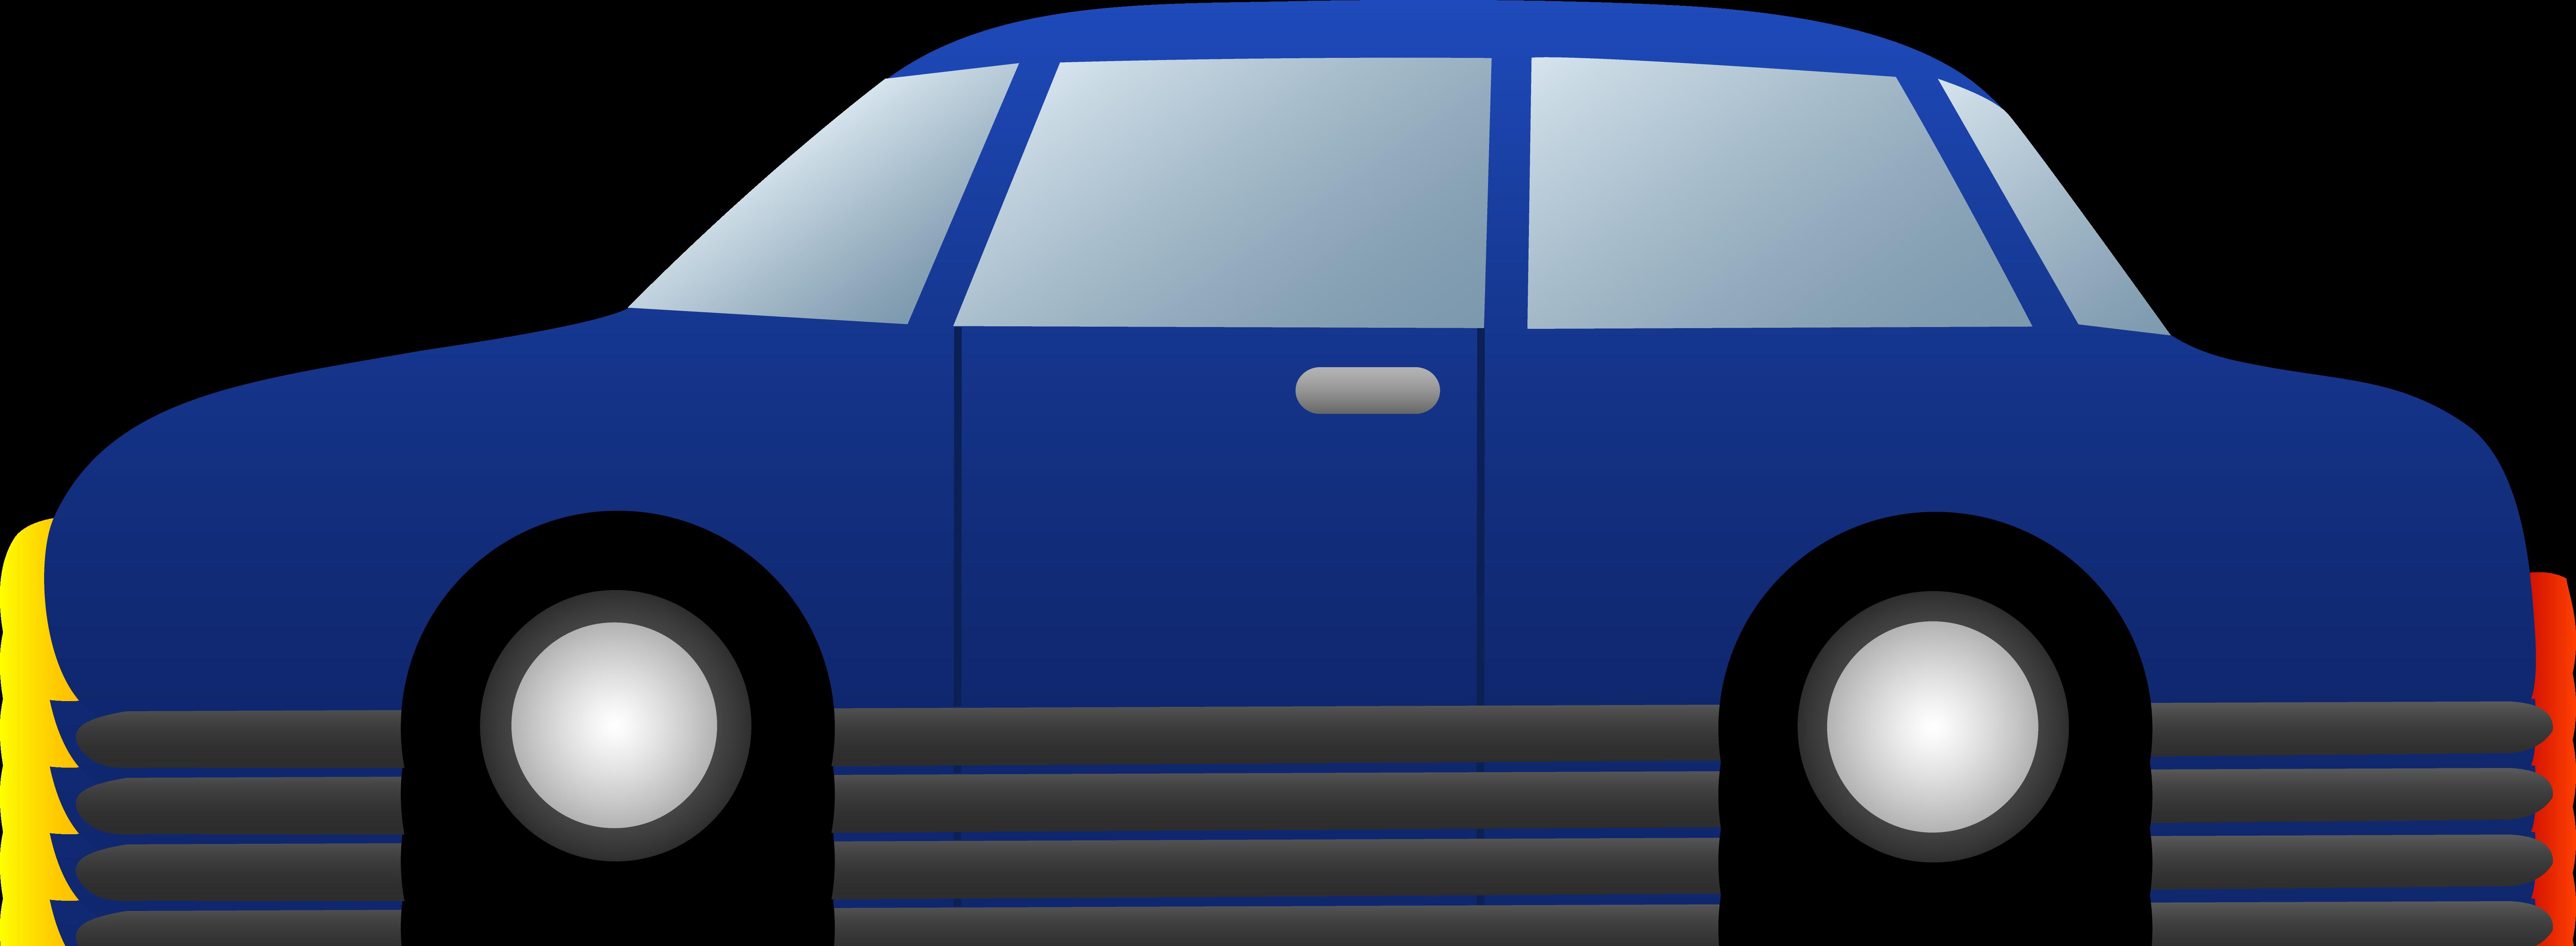 Minivan clipart family retreat. Race car for kids